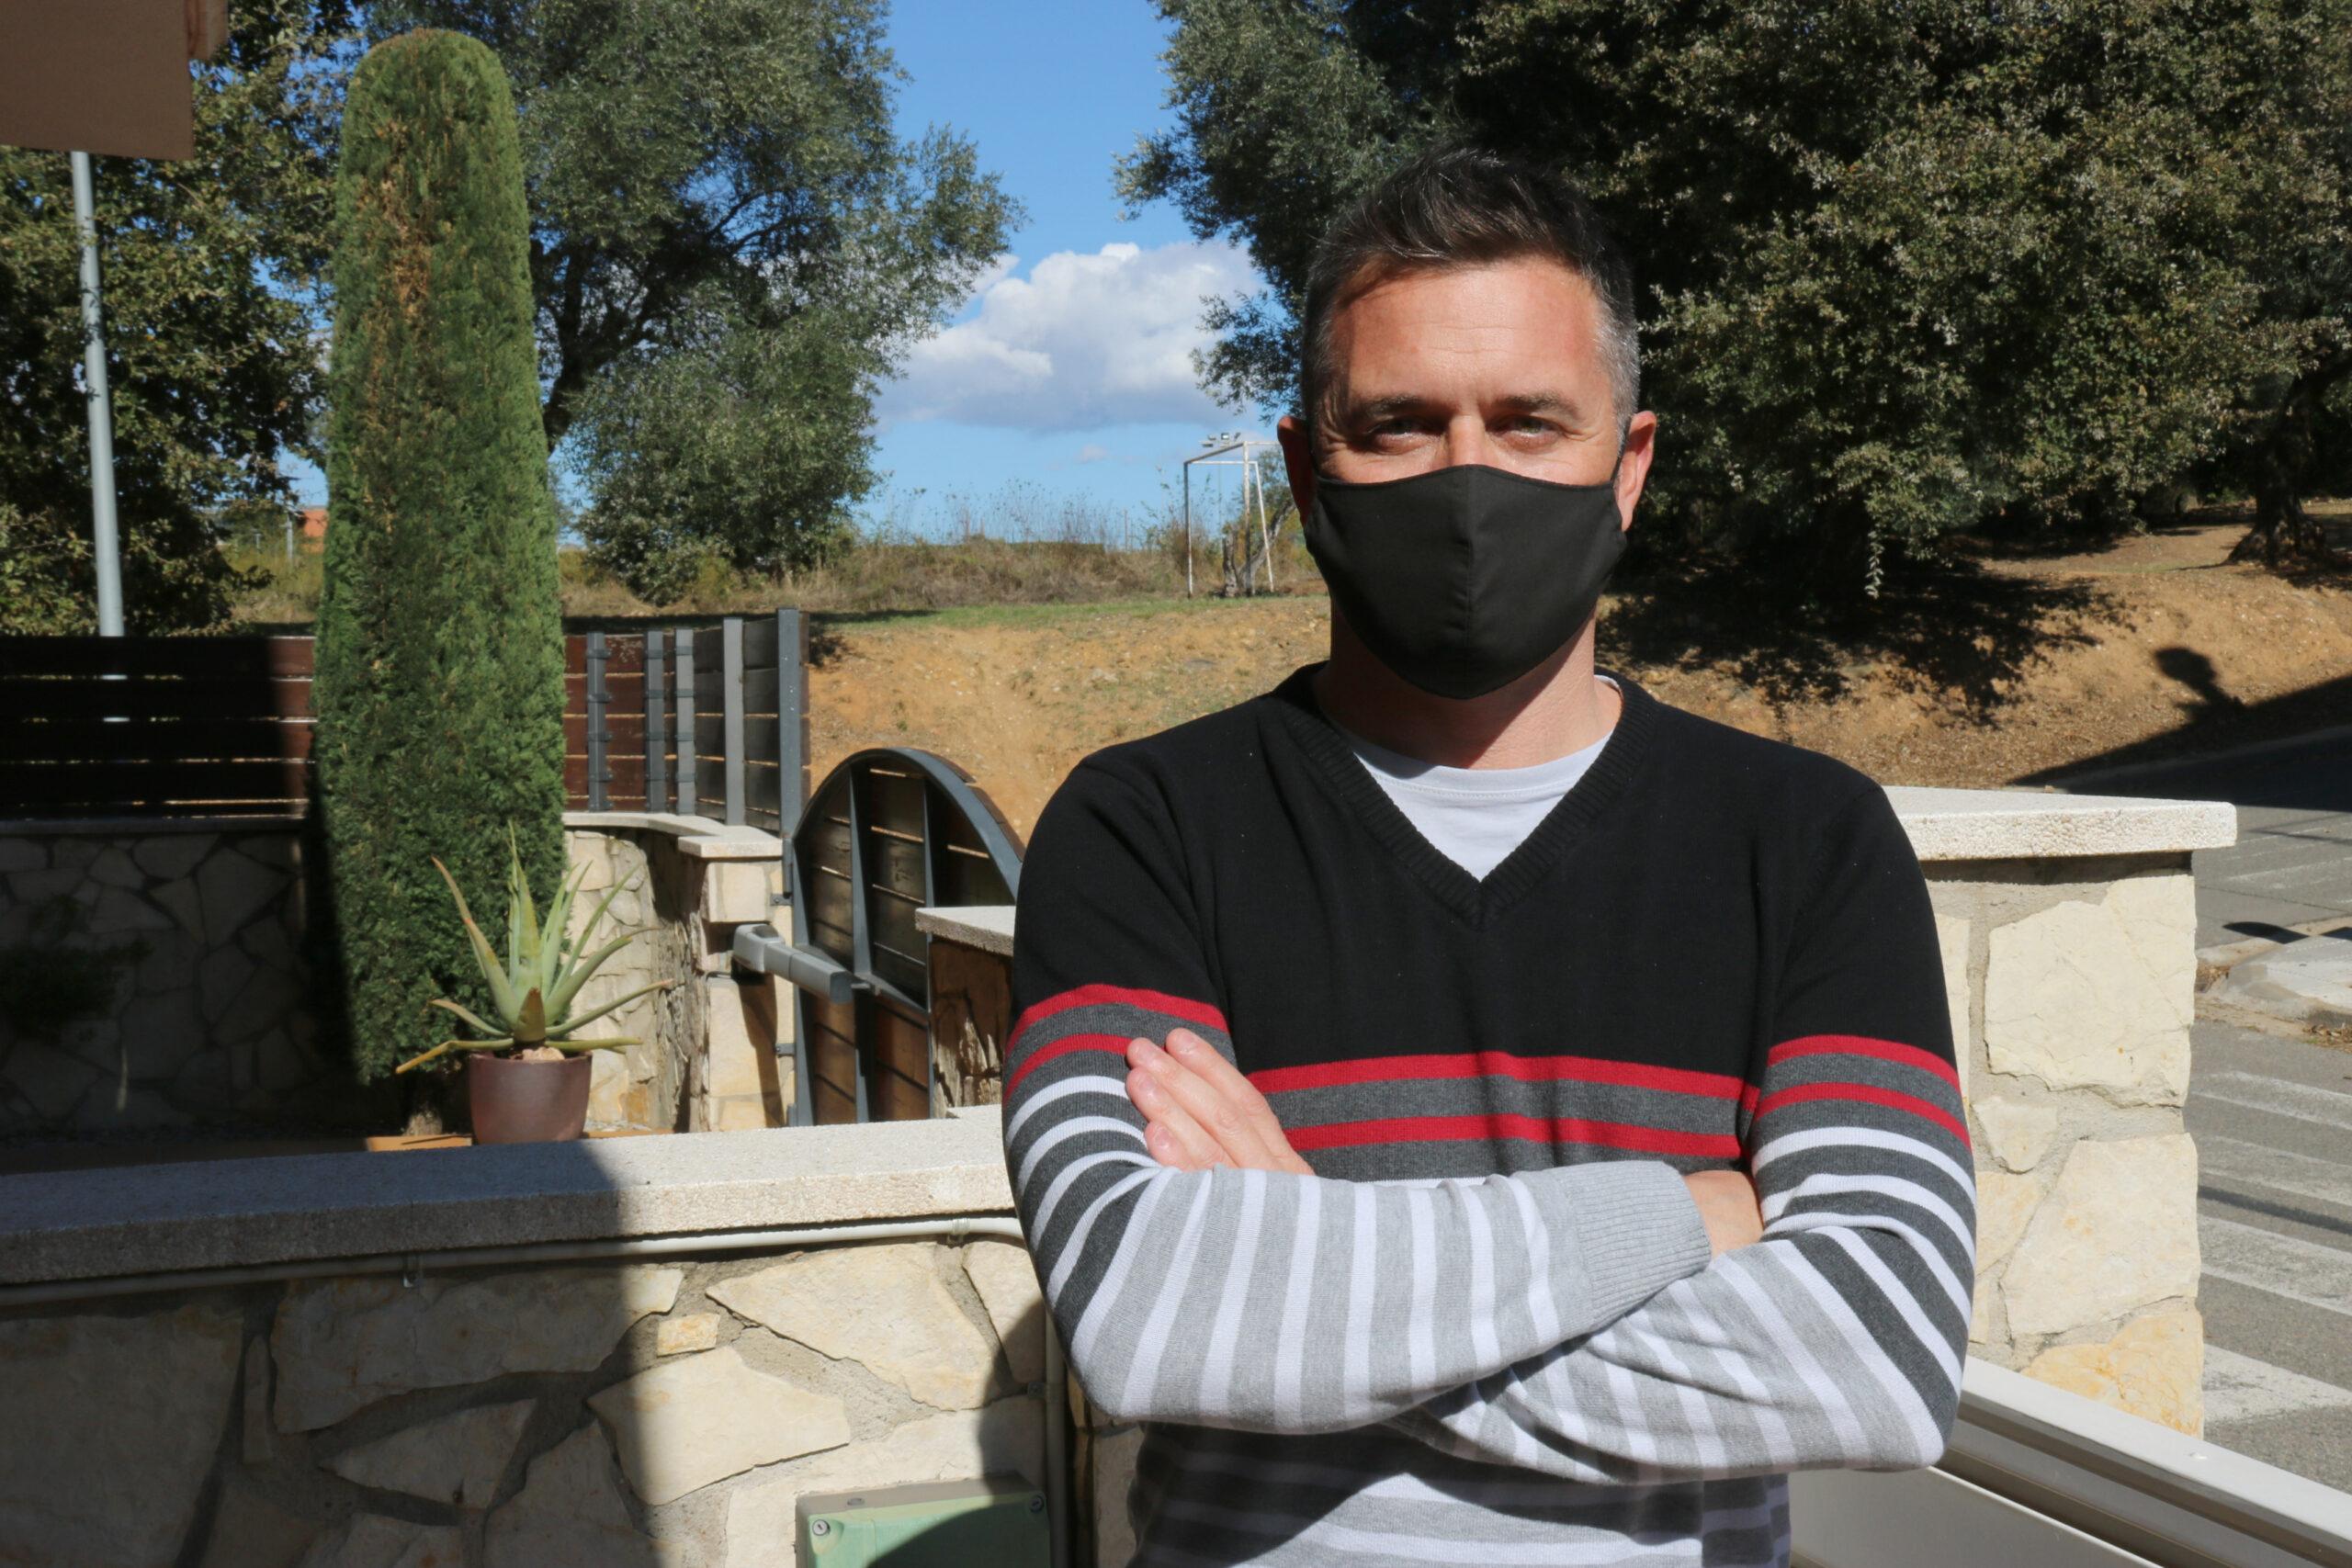 El promotor de la iniciativa i gerent de Creativa Online, Jordi Torres | ACN